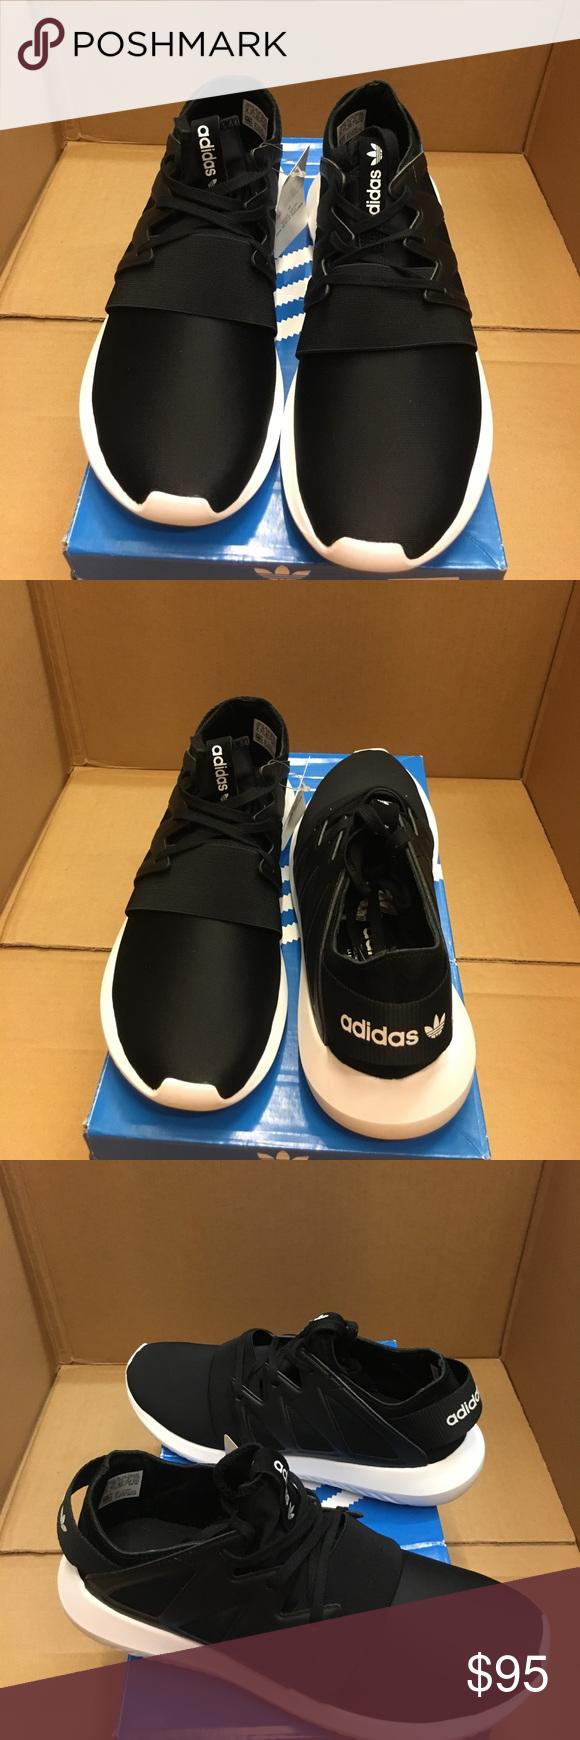 Brand New in Box Adidas tubular NWT zapatillas, Adidas zapatos